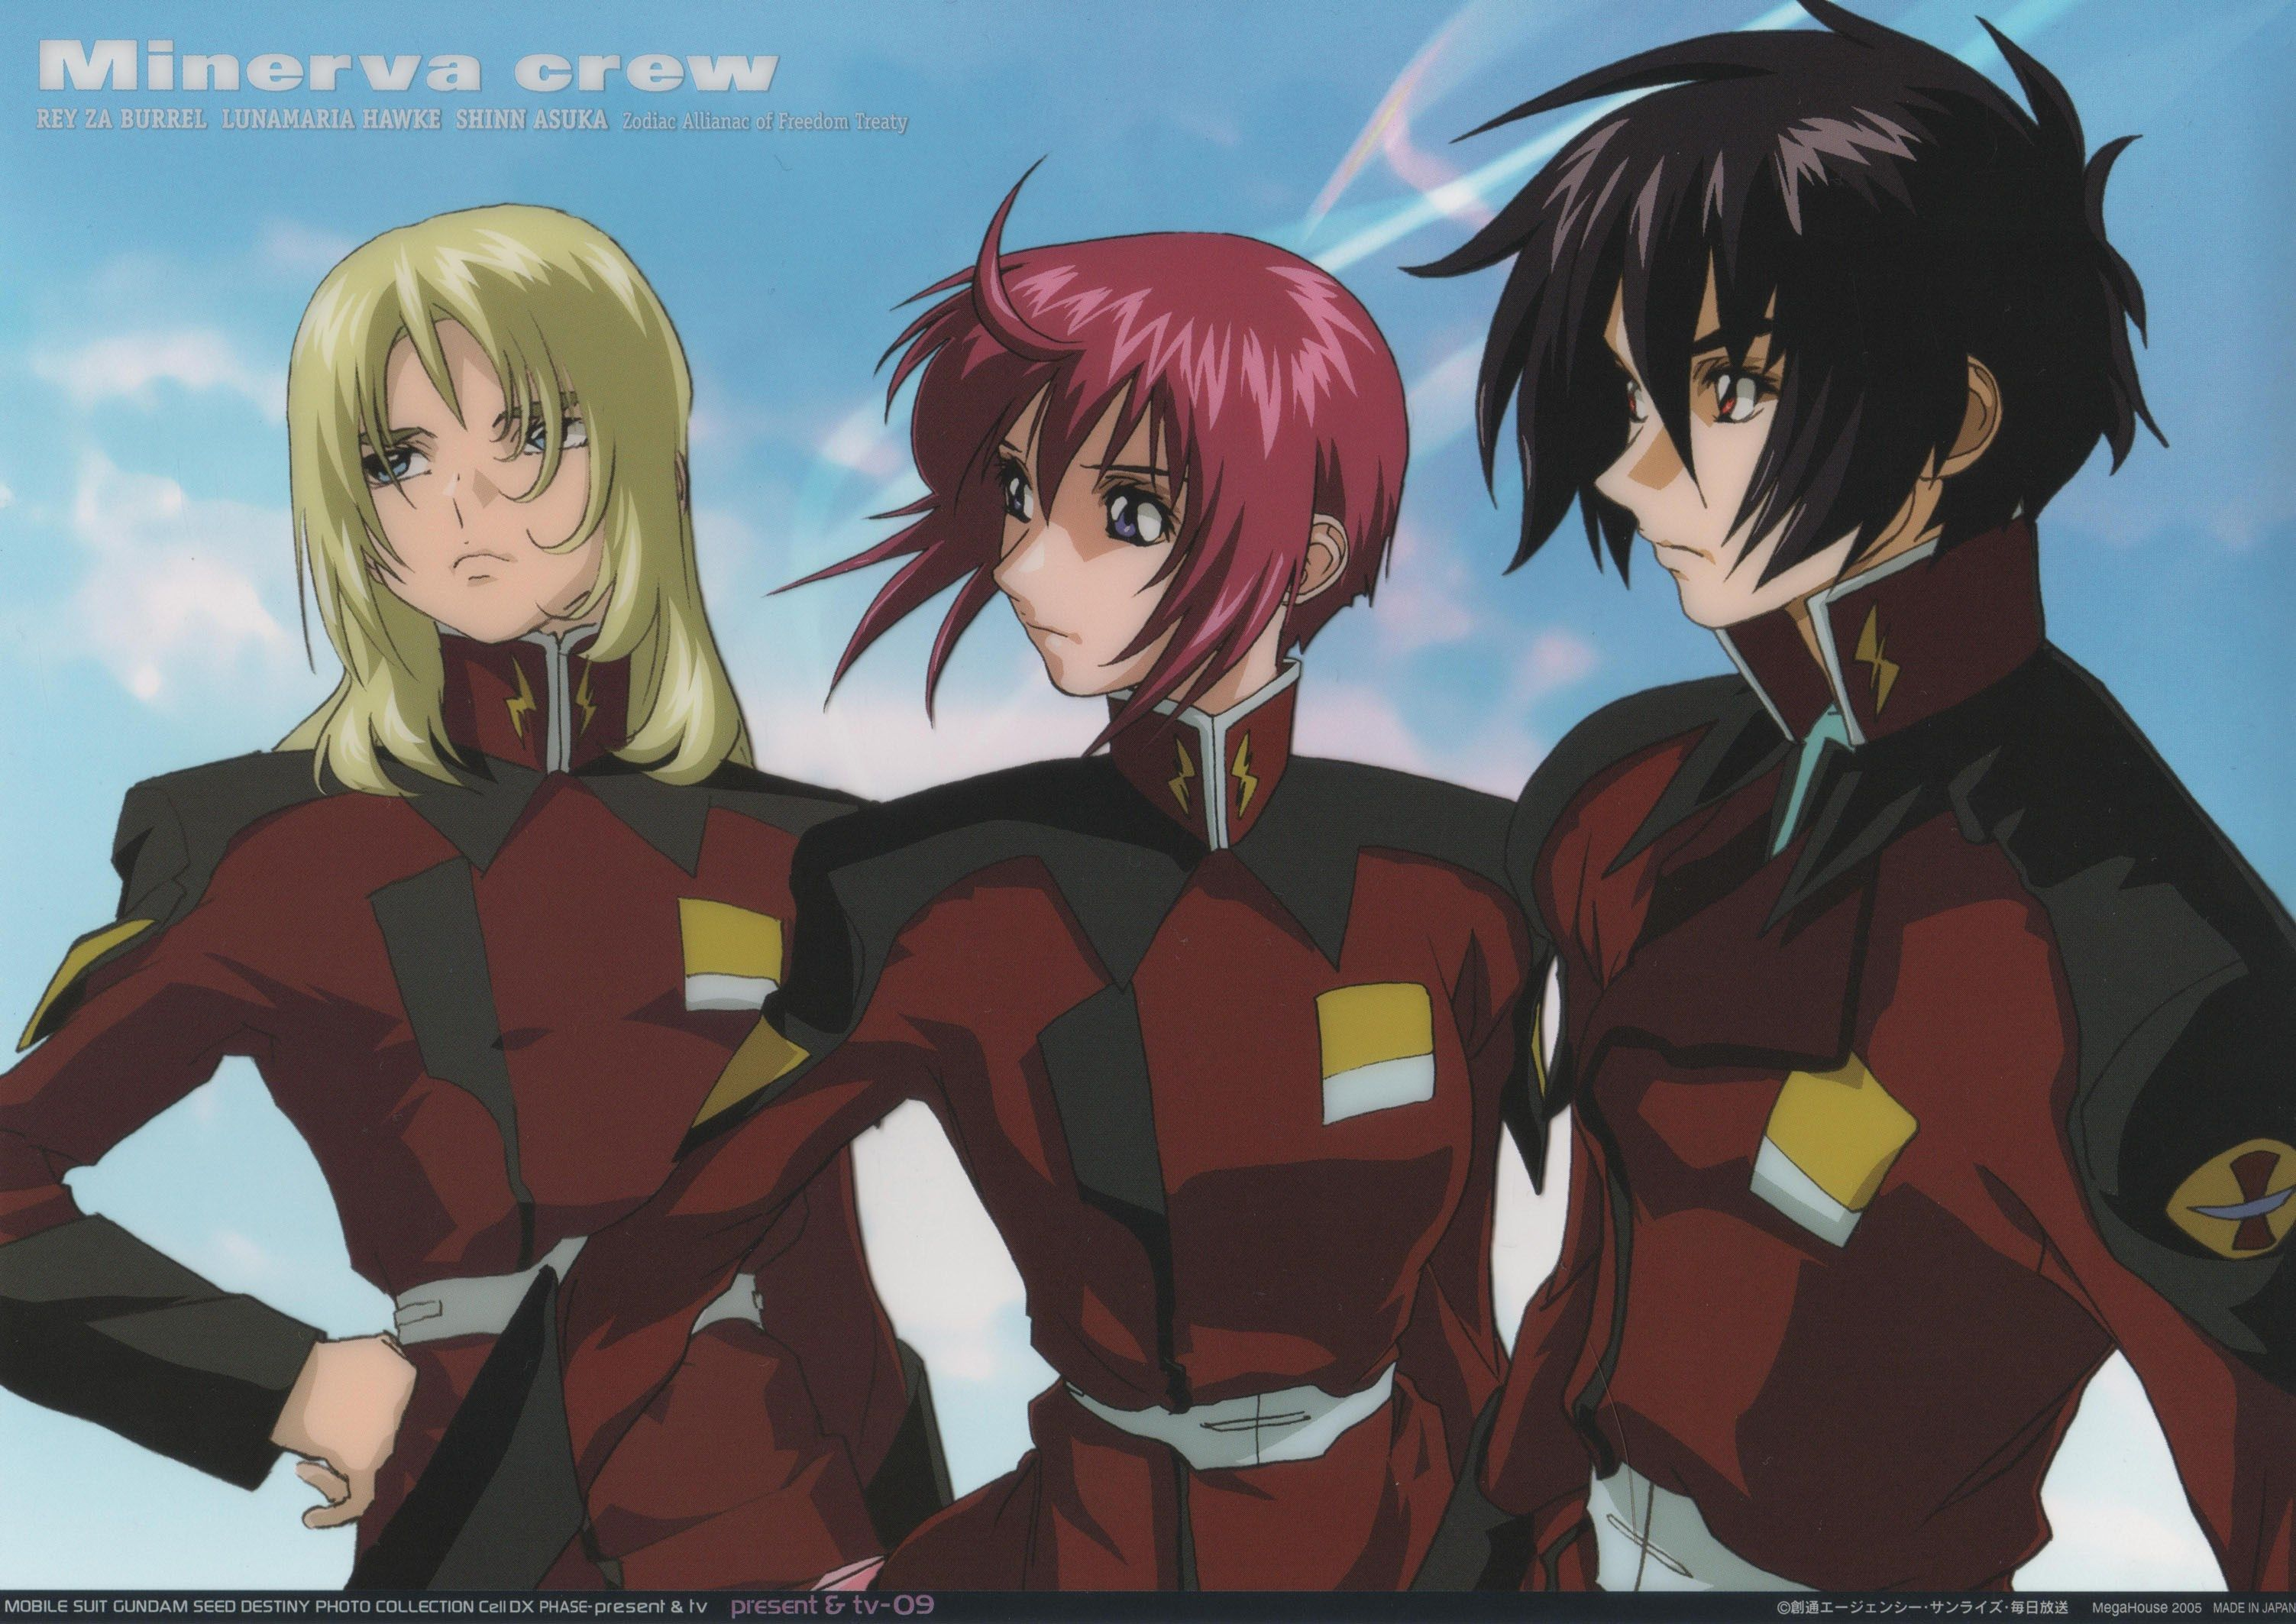 Mobile Suit Gundam Seed Destiny Full Hd Wallpaper Photo